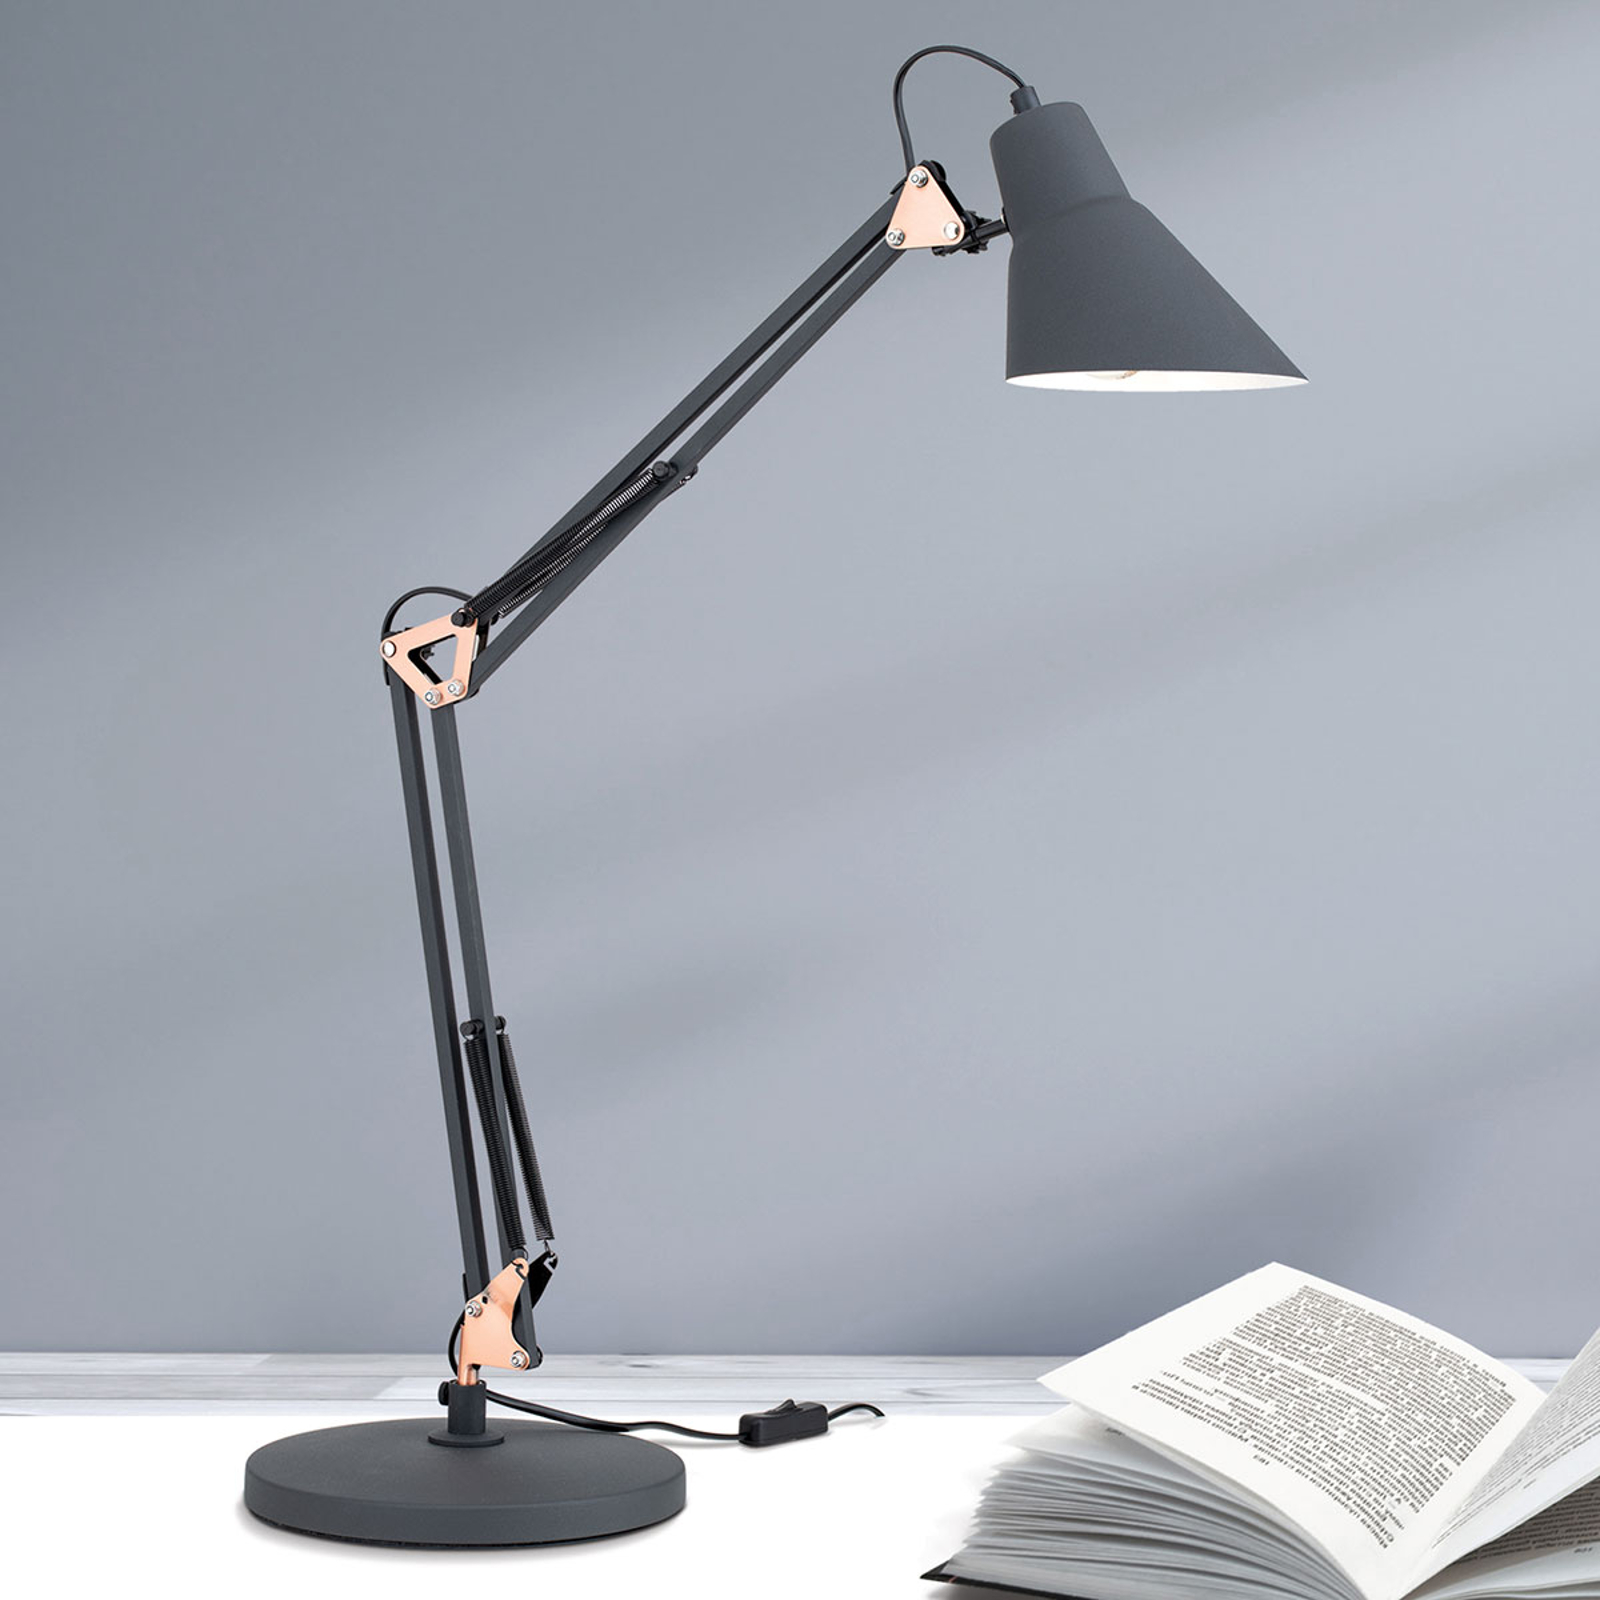 Drievoudig verstelbare tafellamp Bachelor